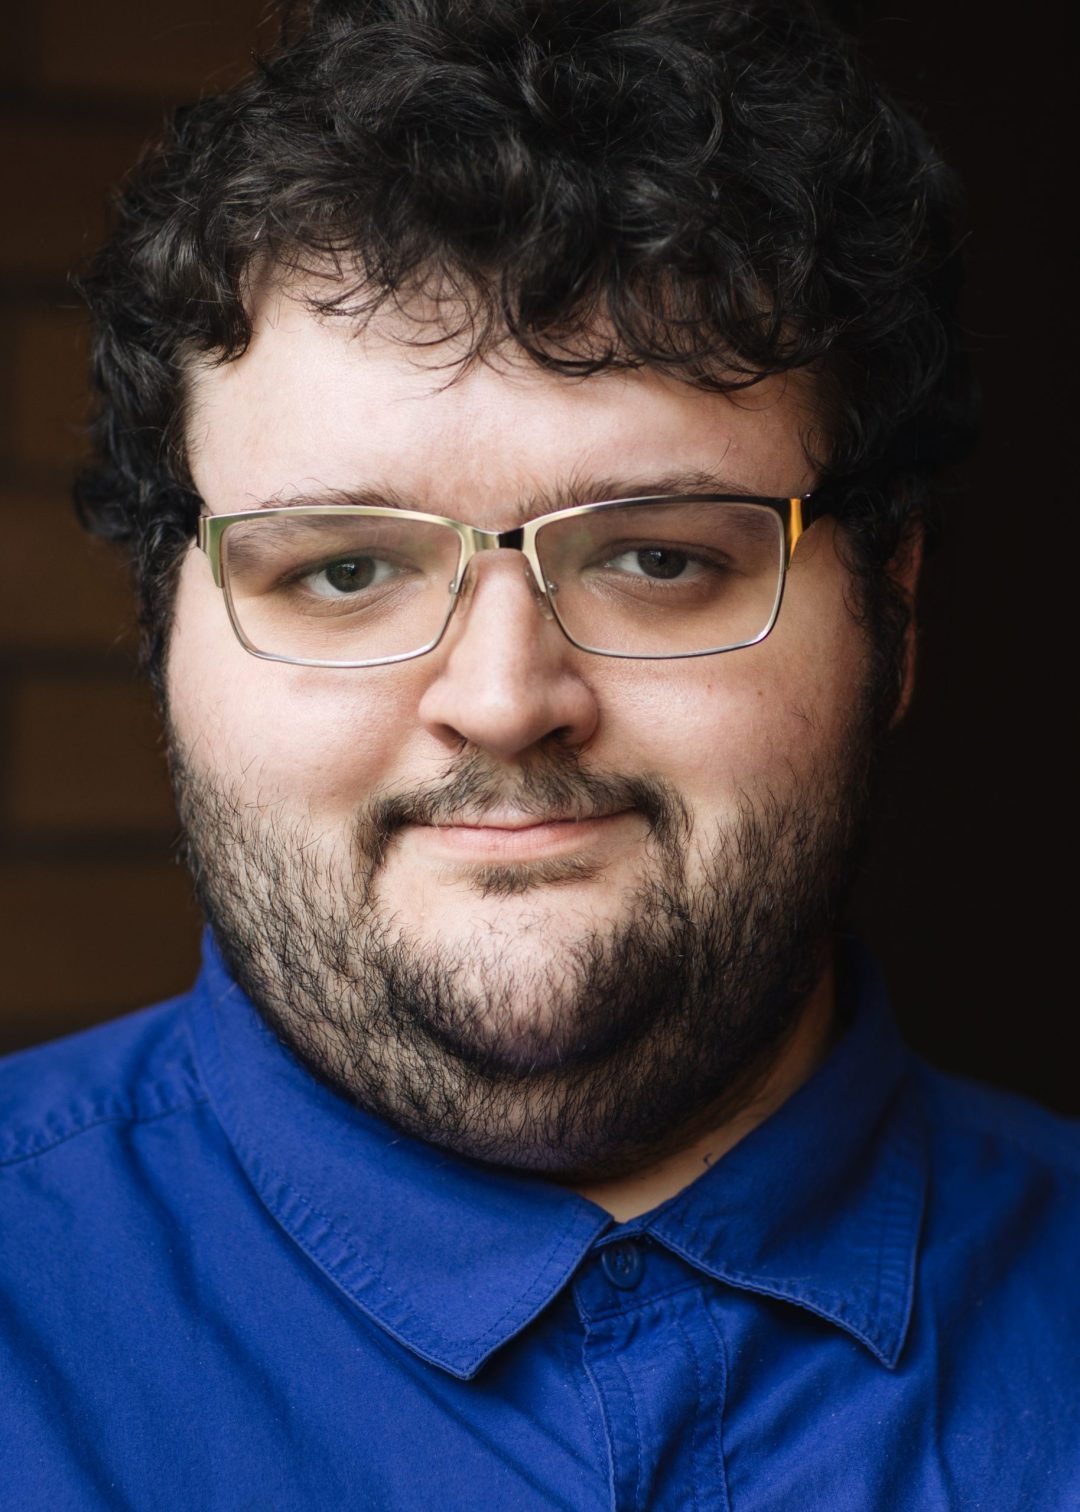 Aaron Crhak